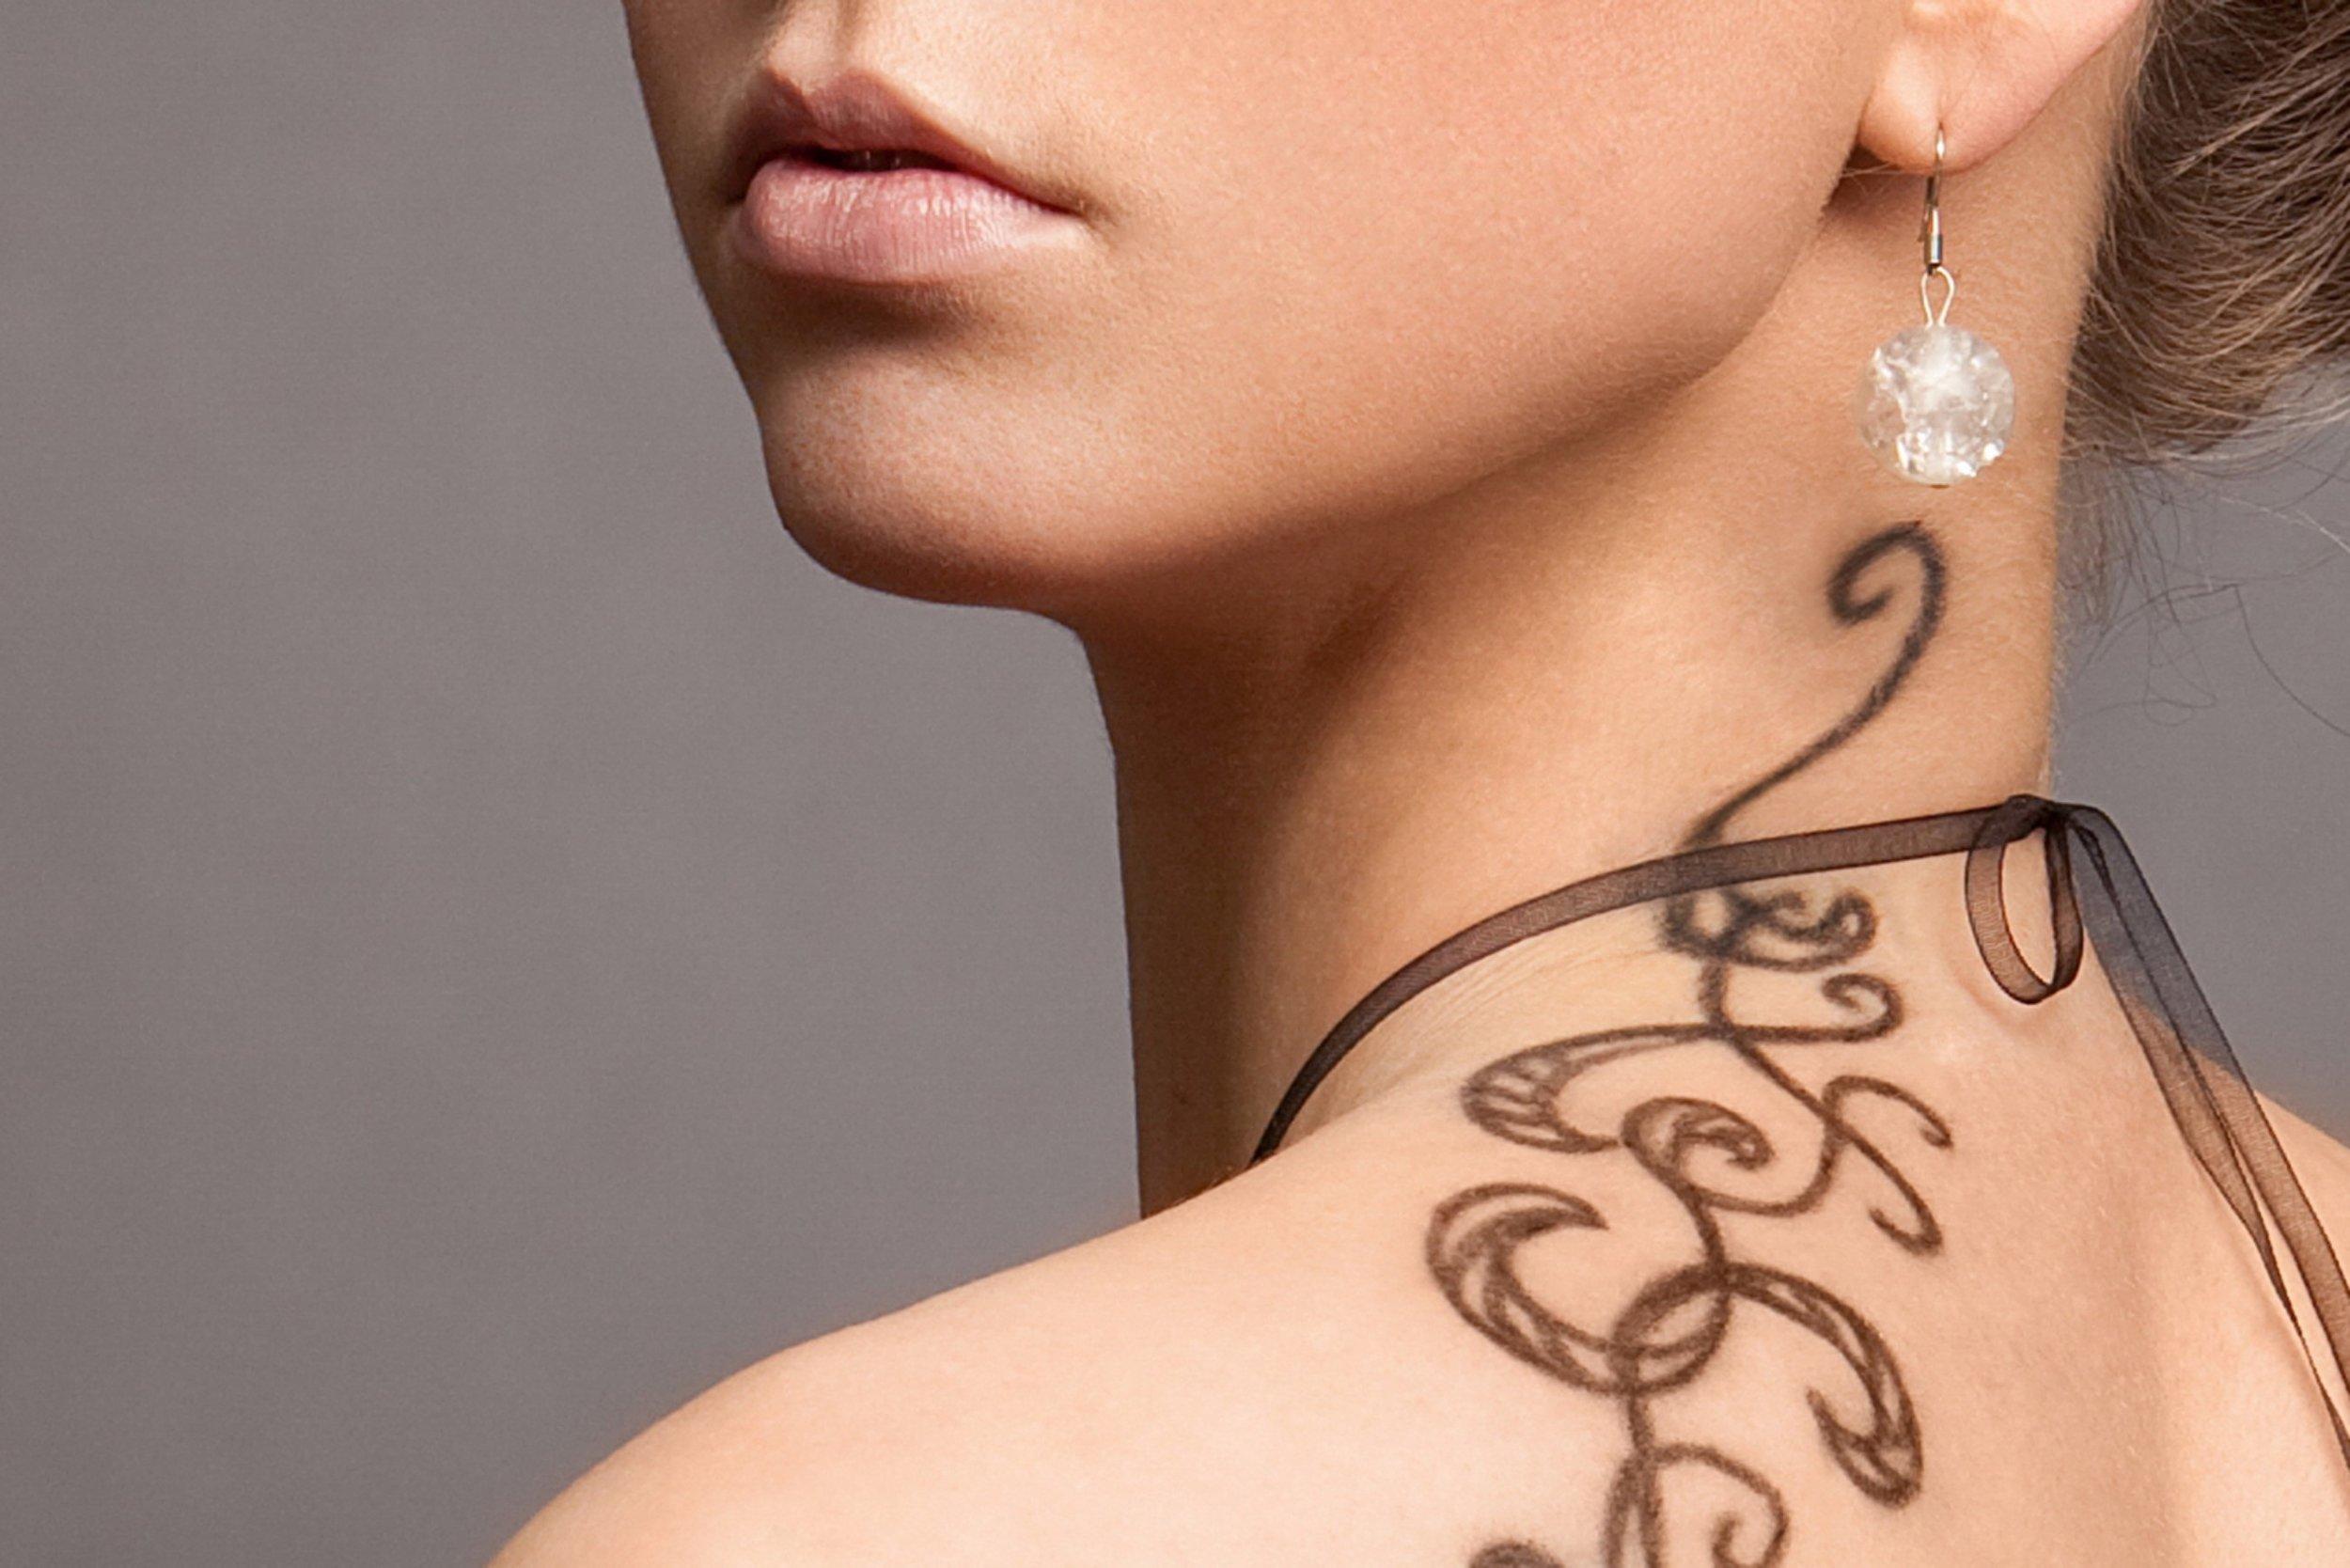 pic of tattoo girl on neck.jpg